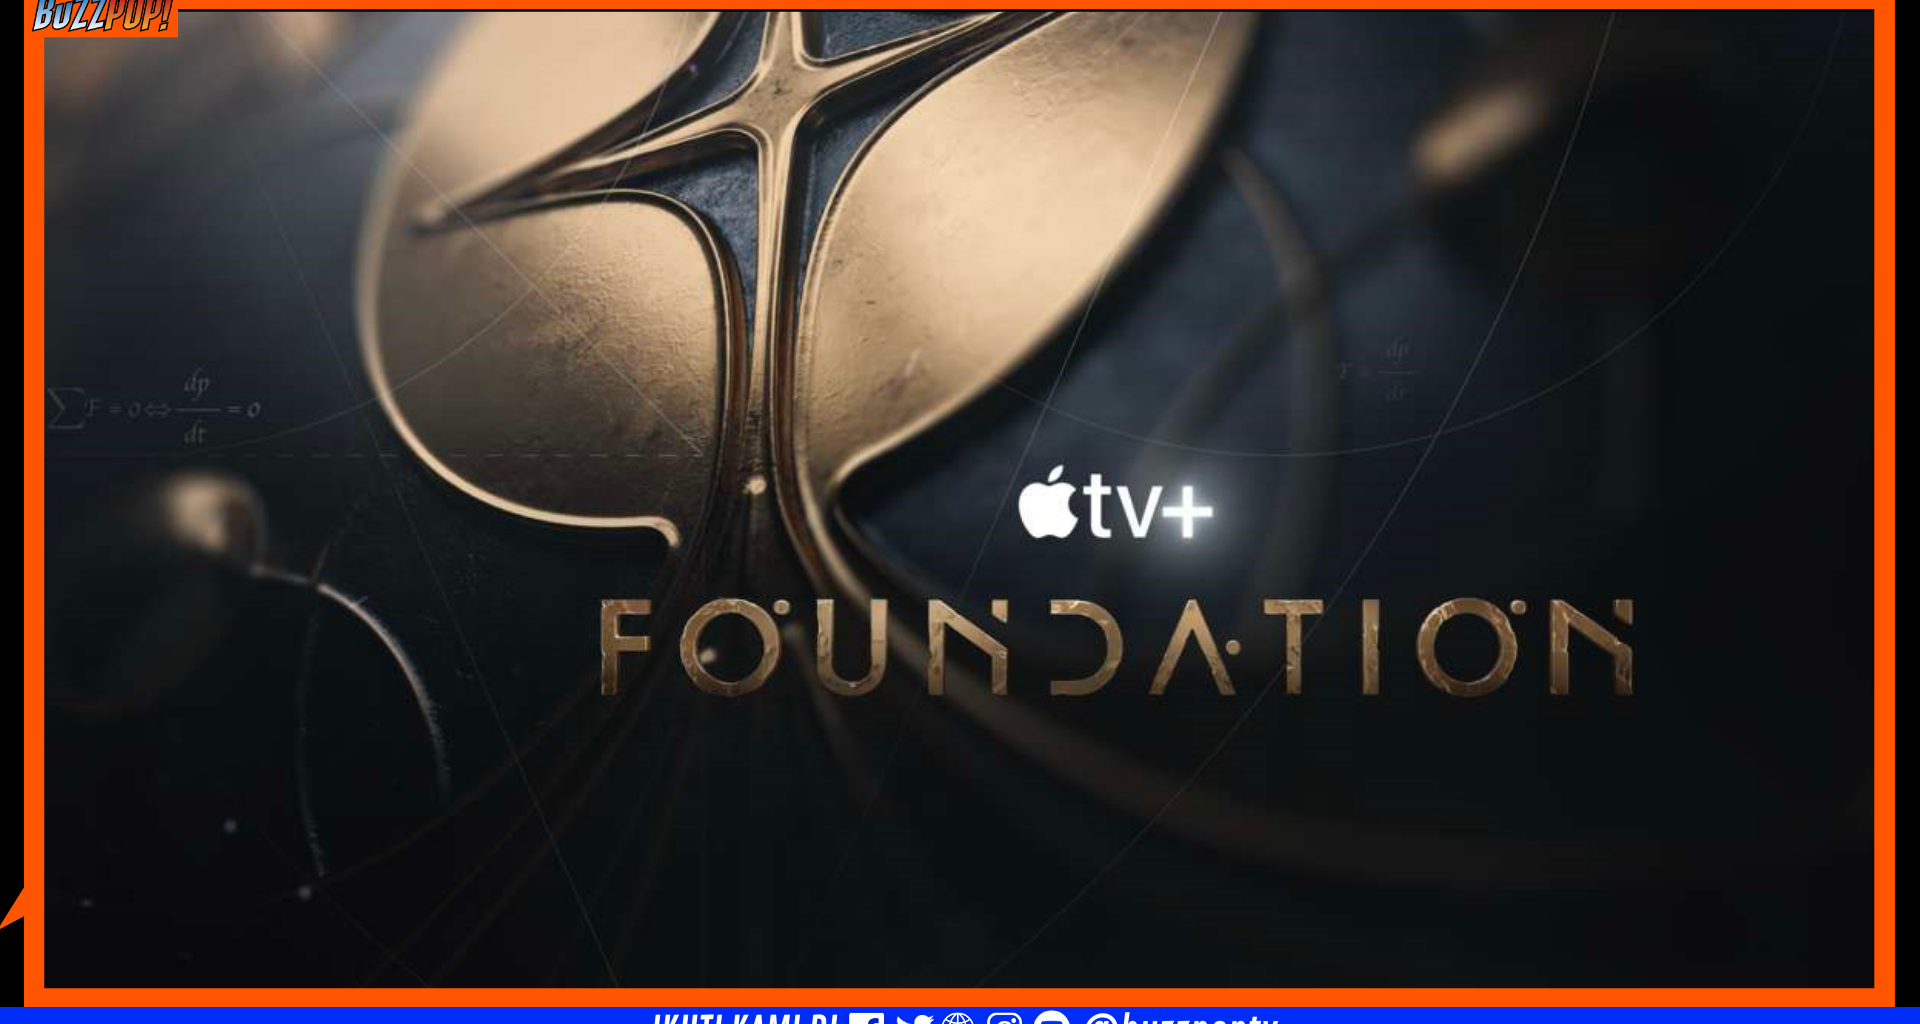 FOUNDATION Apple TV+ Isaac Asimov Sci Fi TV Series